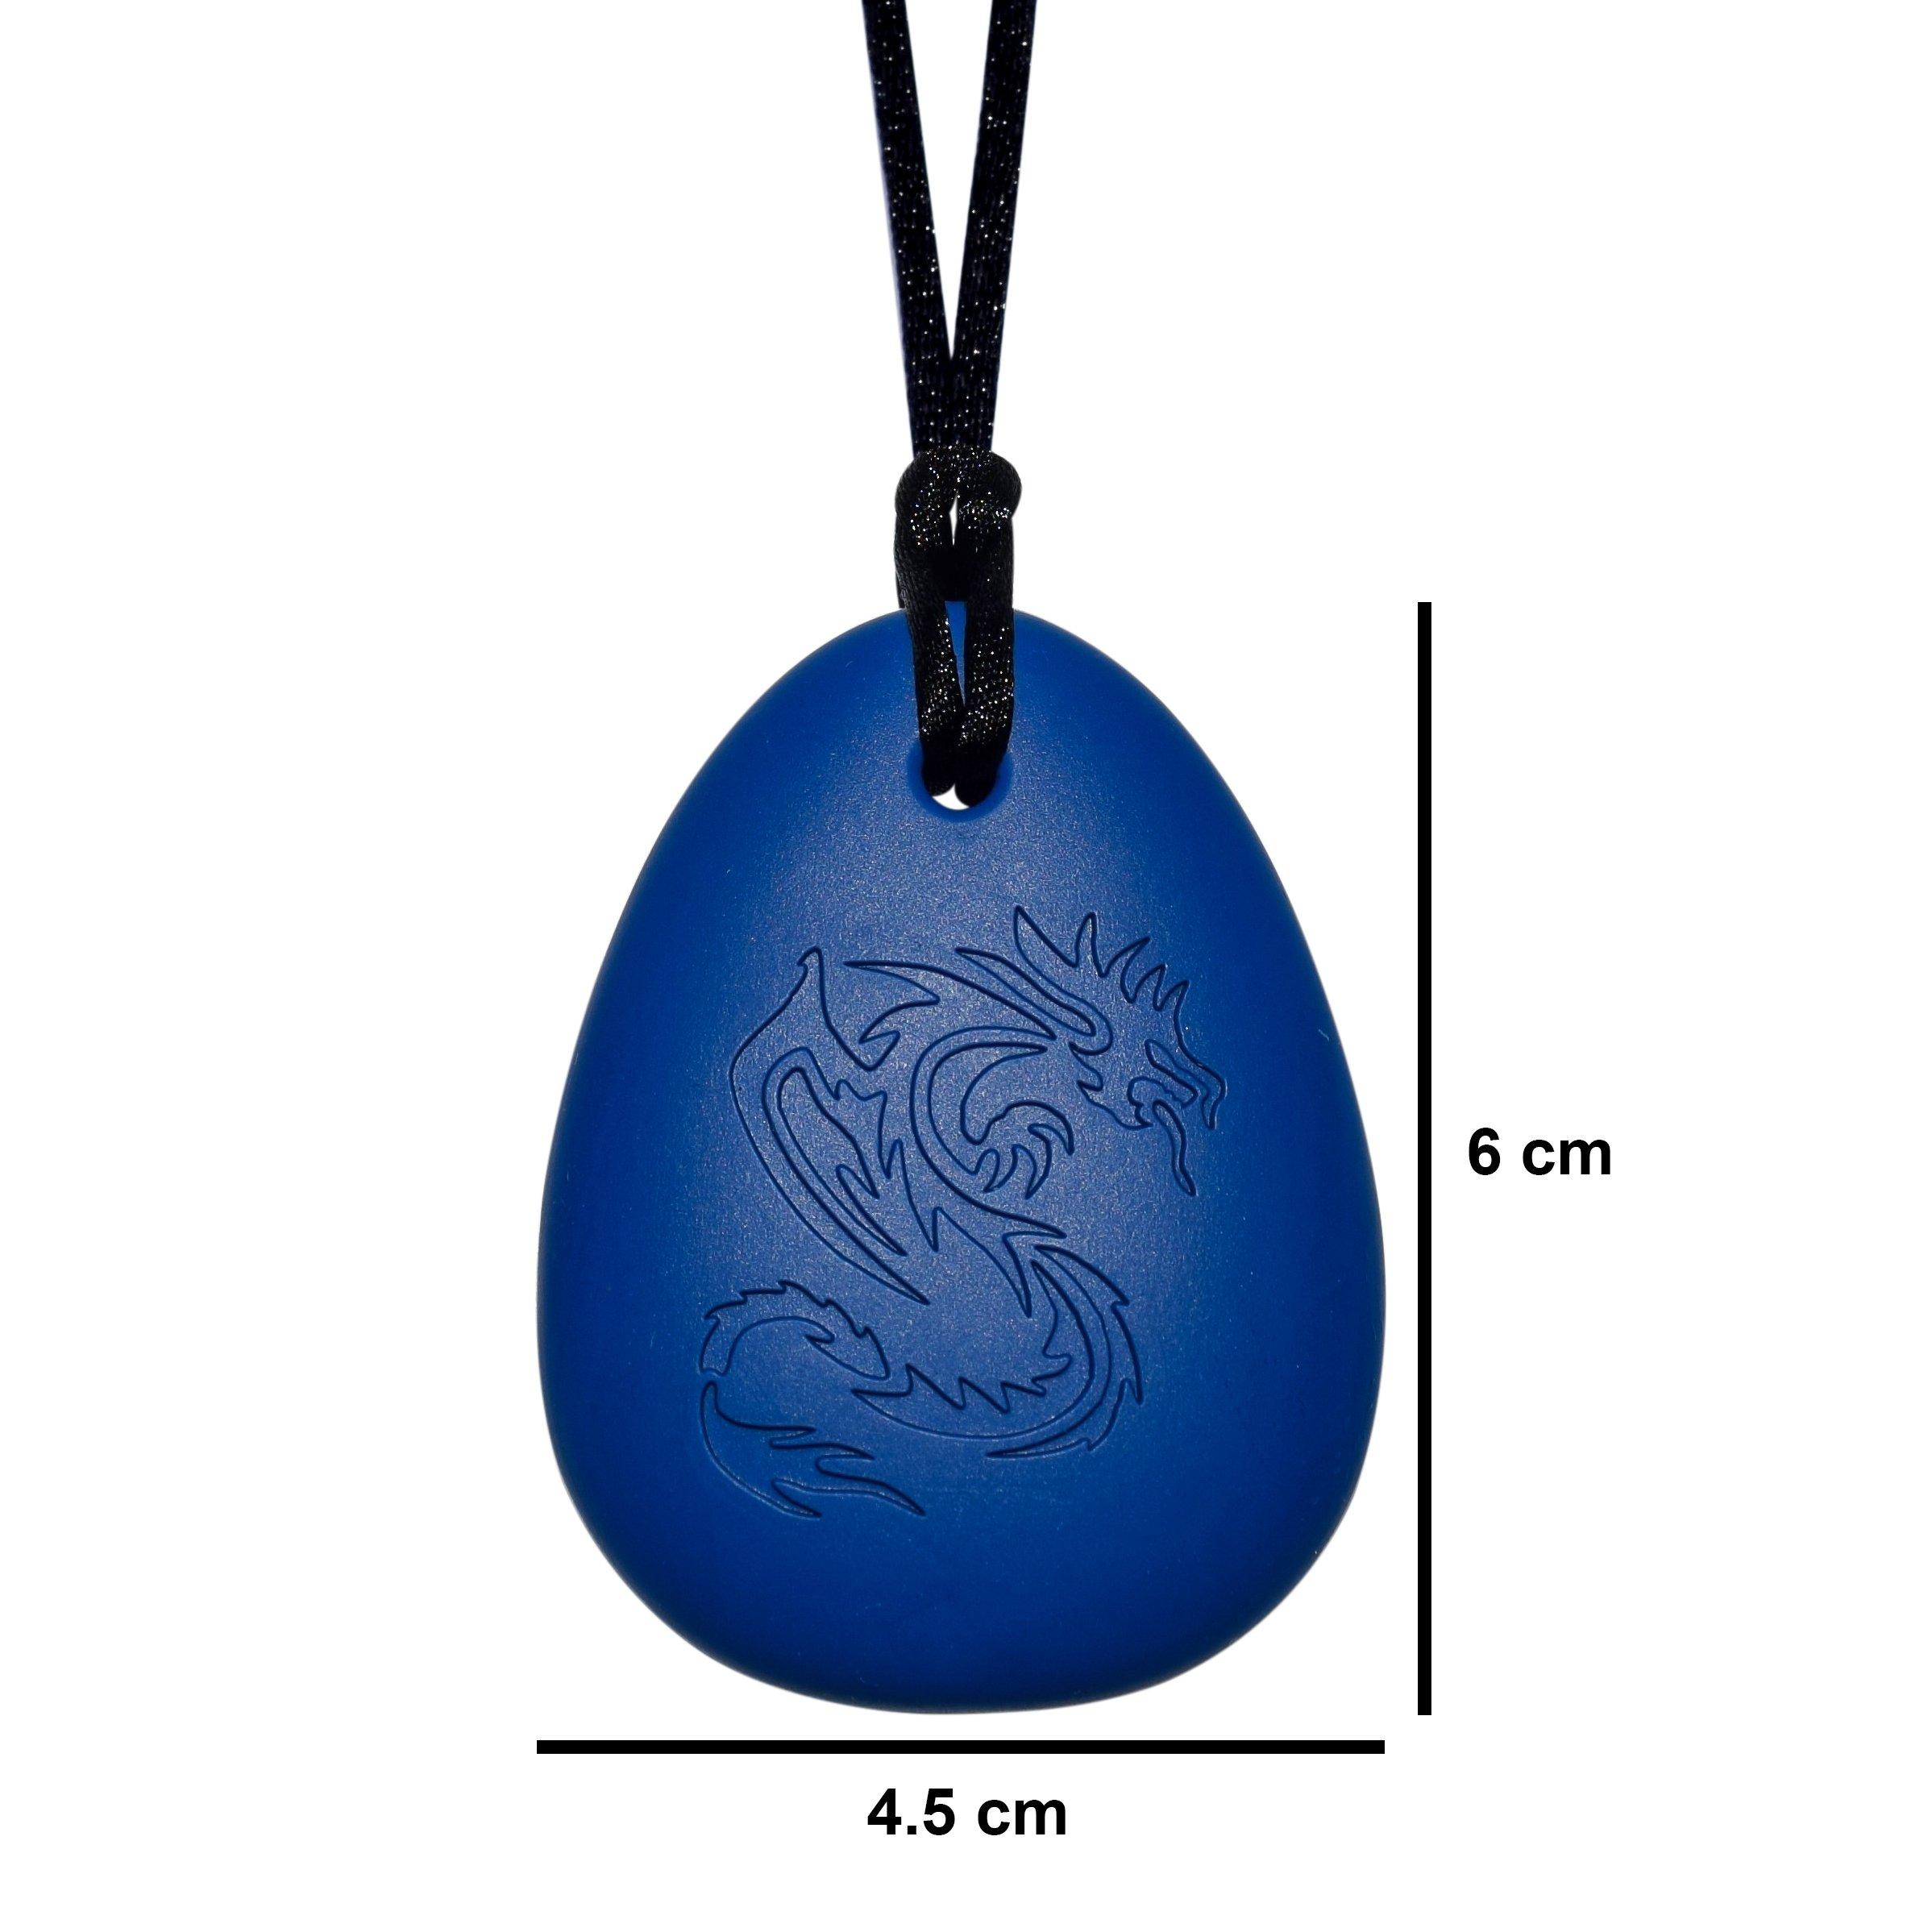 Dragon Sensory Chewelry - Munchables Chew Necklace (Red) by Munchables Chewelry (Image #3)